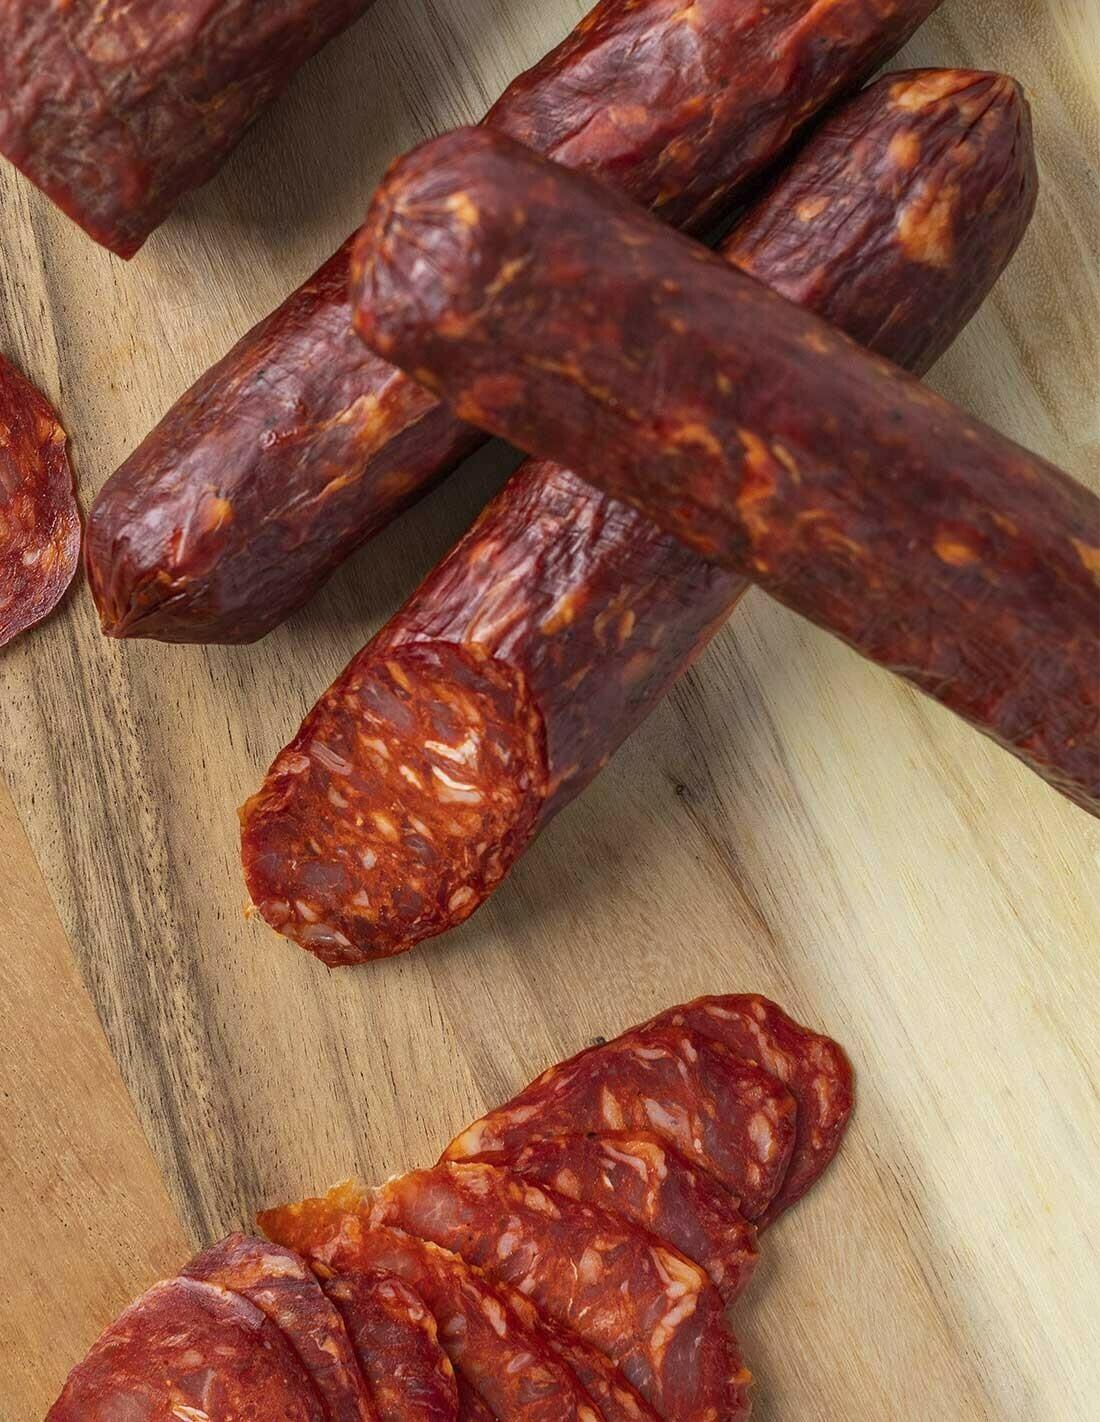 Chorizo Superior Cantimpalo 8 oz/228g